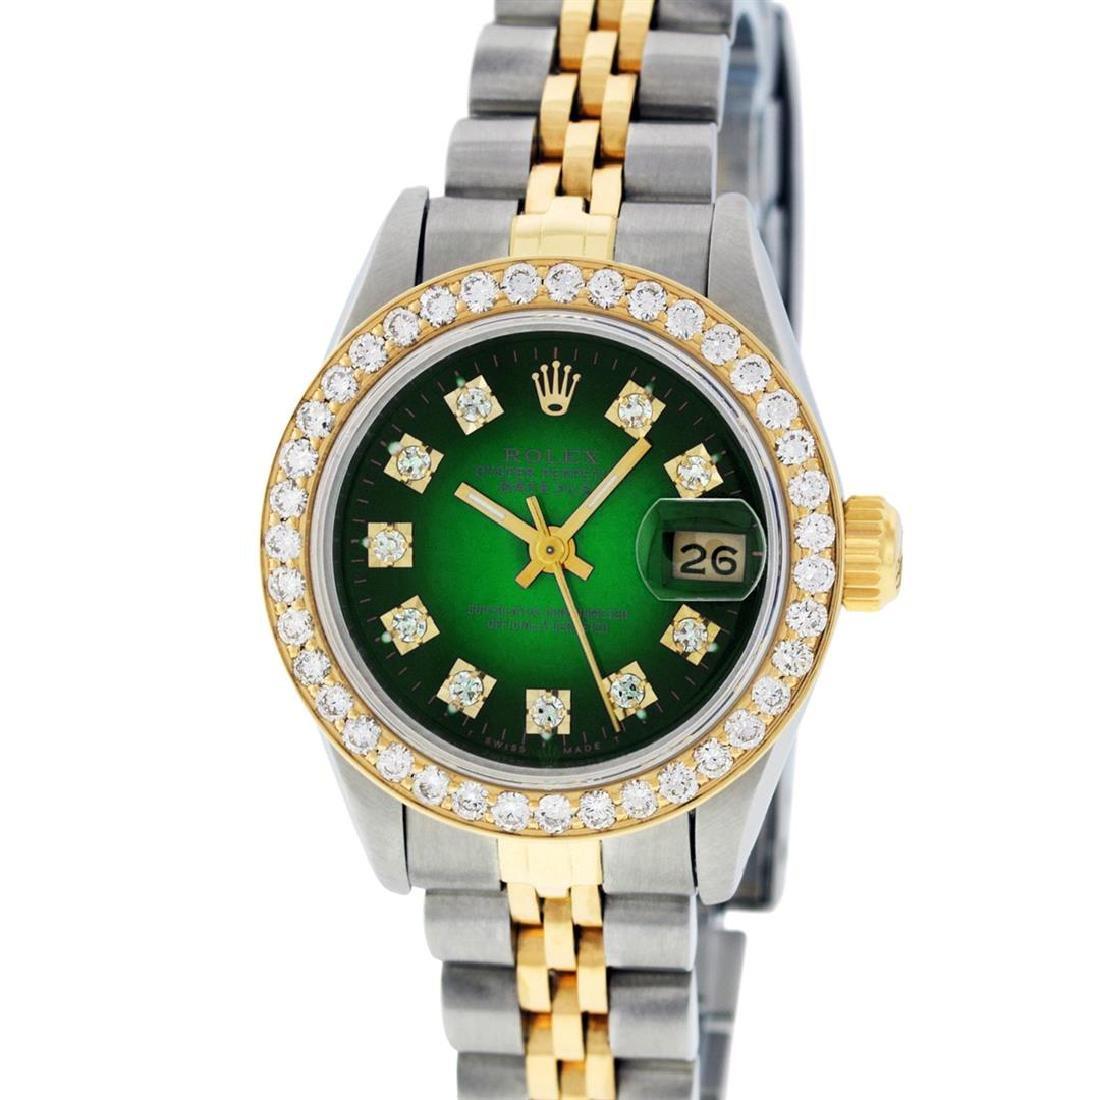 Rolex Ladies Two Tone 14K Green Vignette VS Diamond - 2